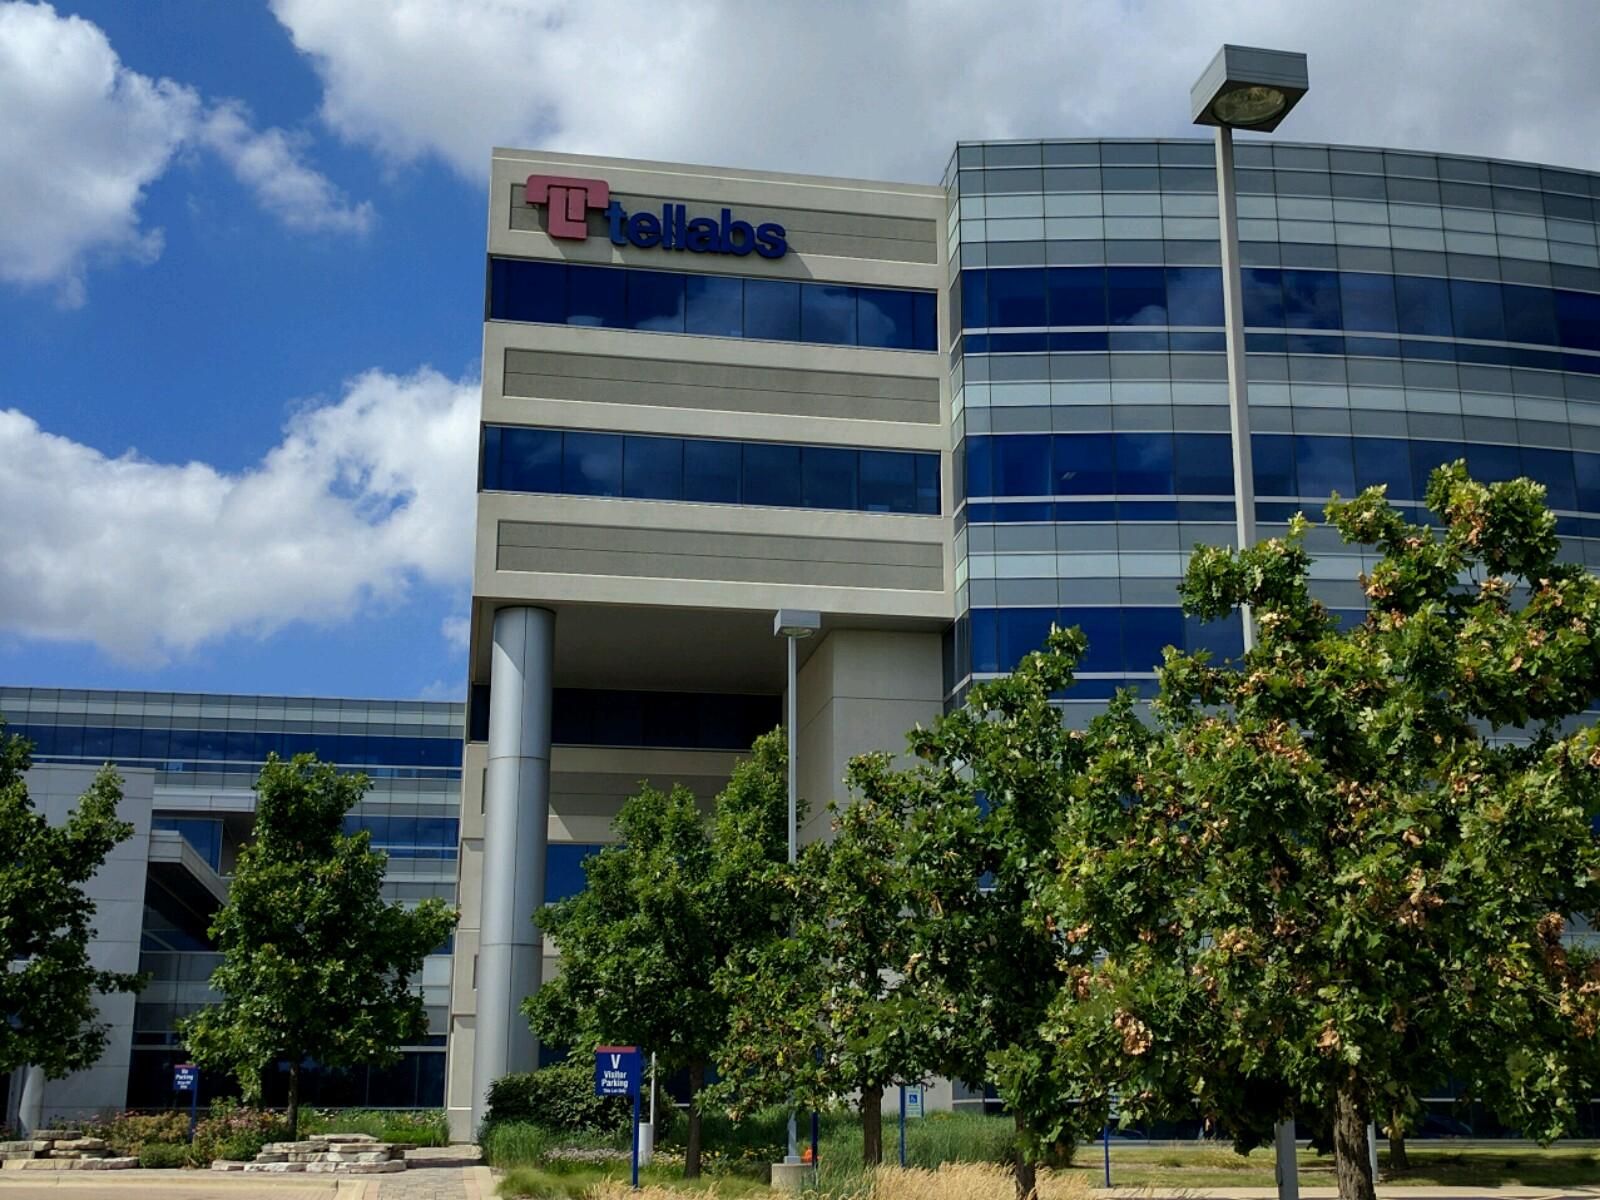 Tellabs' corporate headquarters in Naperville, Illinois.